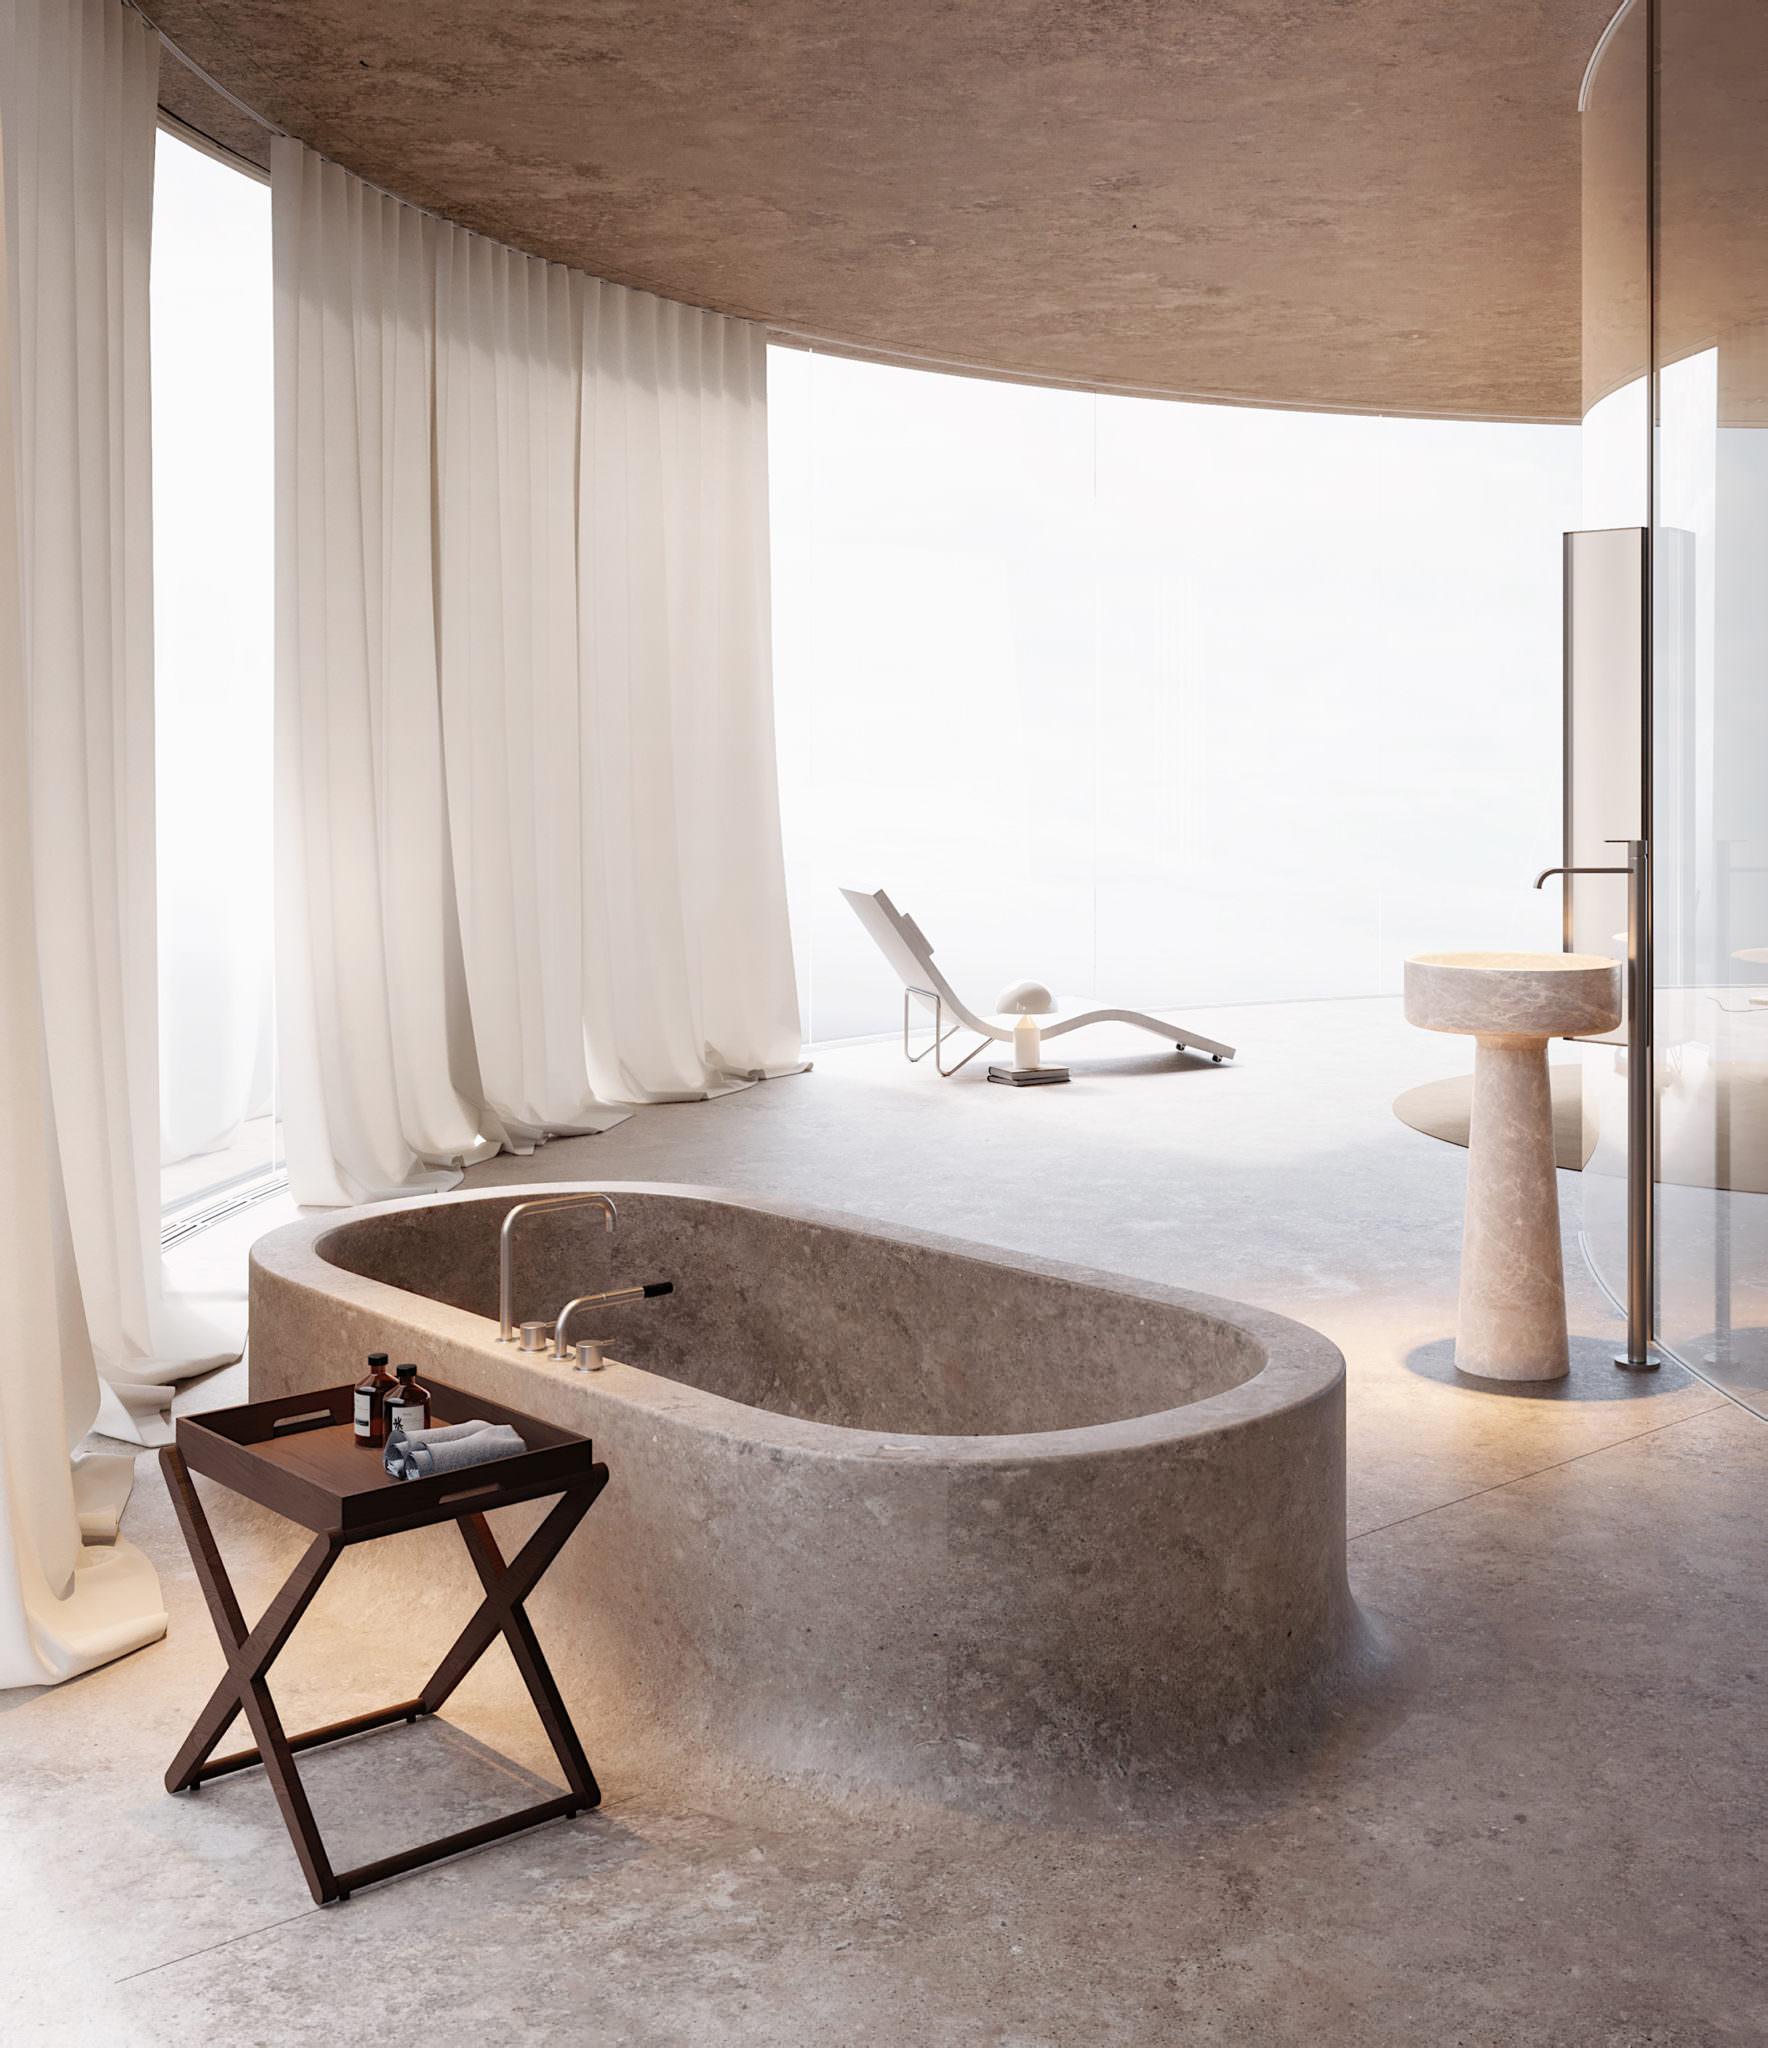 Beach Hotel Concept Design, Odessa Ukraine,Alexey Gulesha,Sivak Partners | Yellowtrace